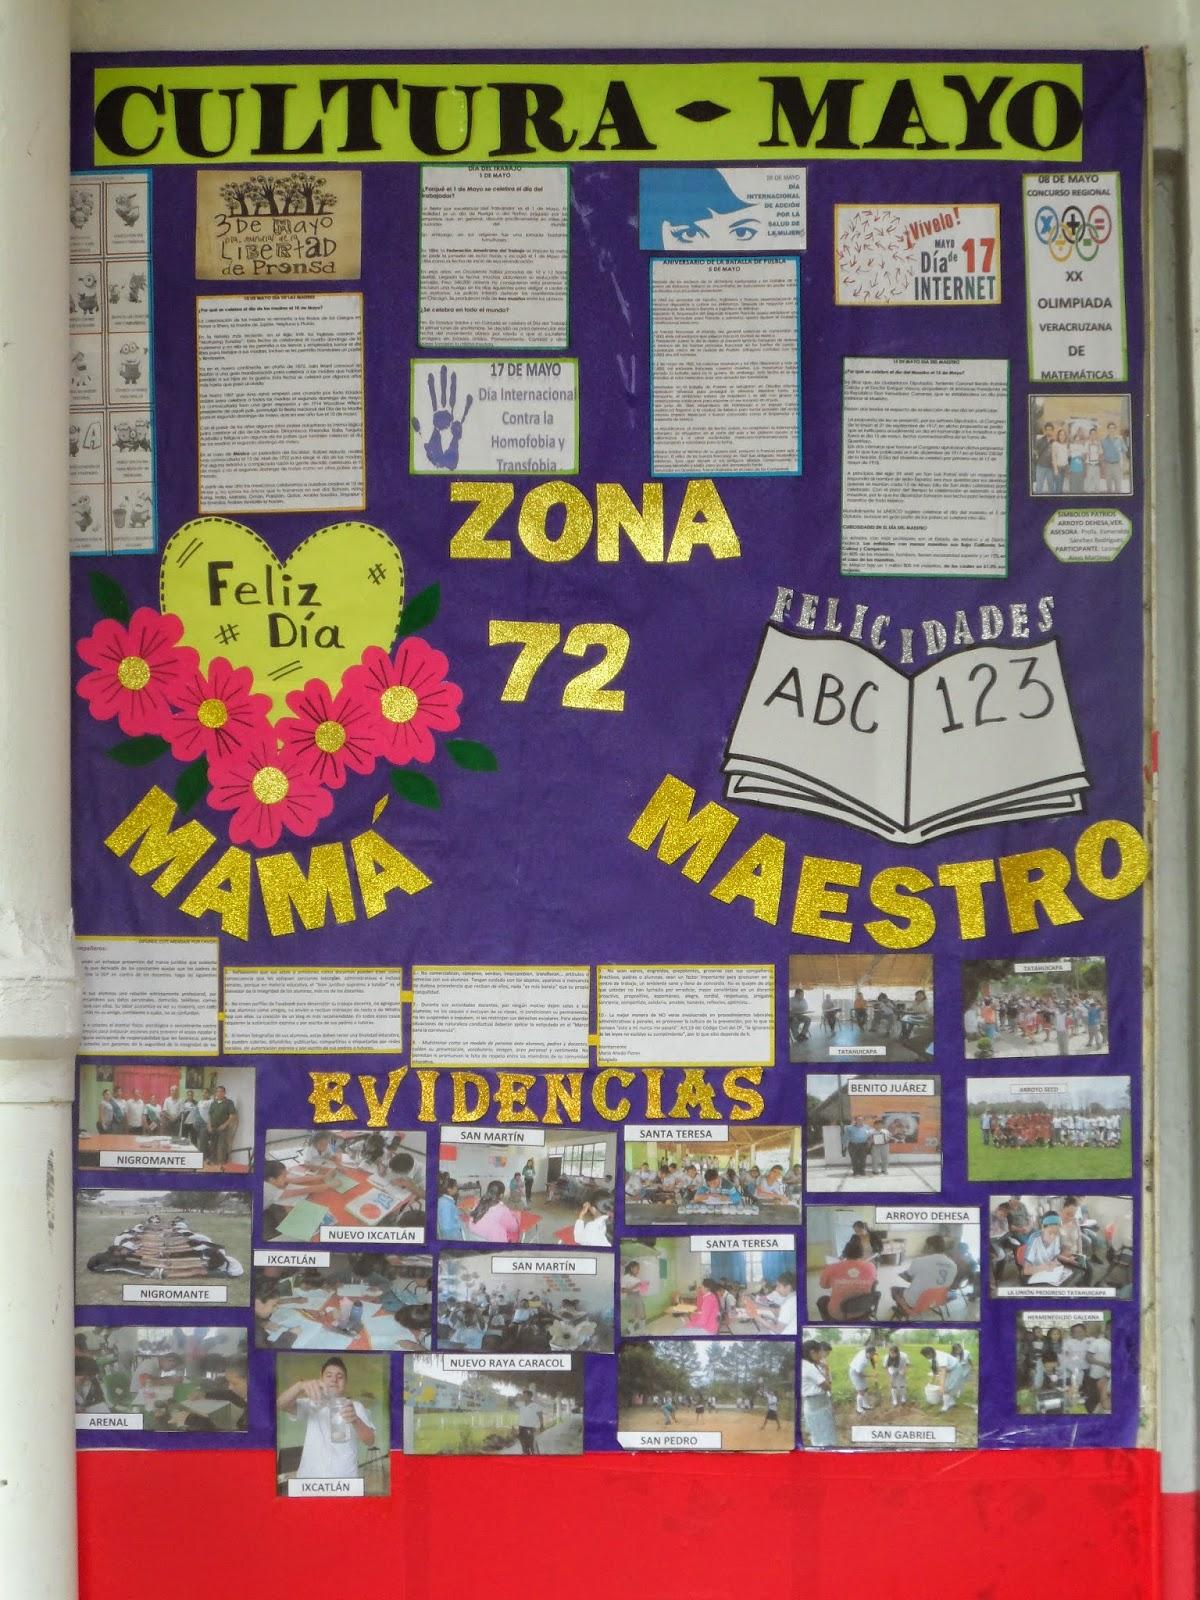 Supervisi n escolar zona 72 telesecundarias playa vicente for El periodico mural